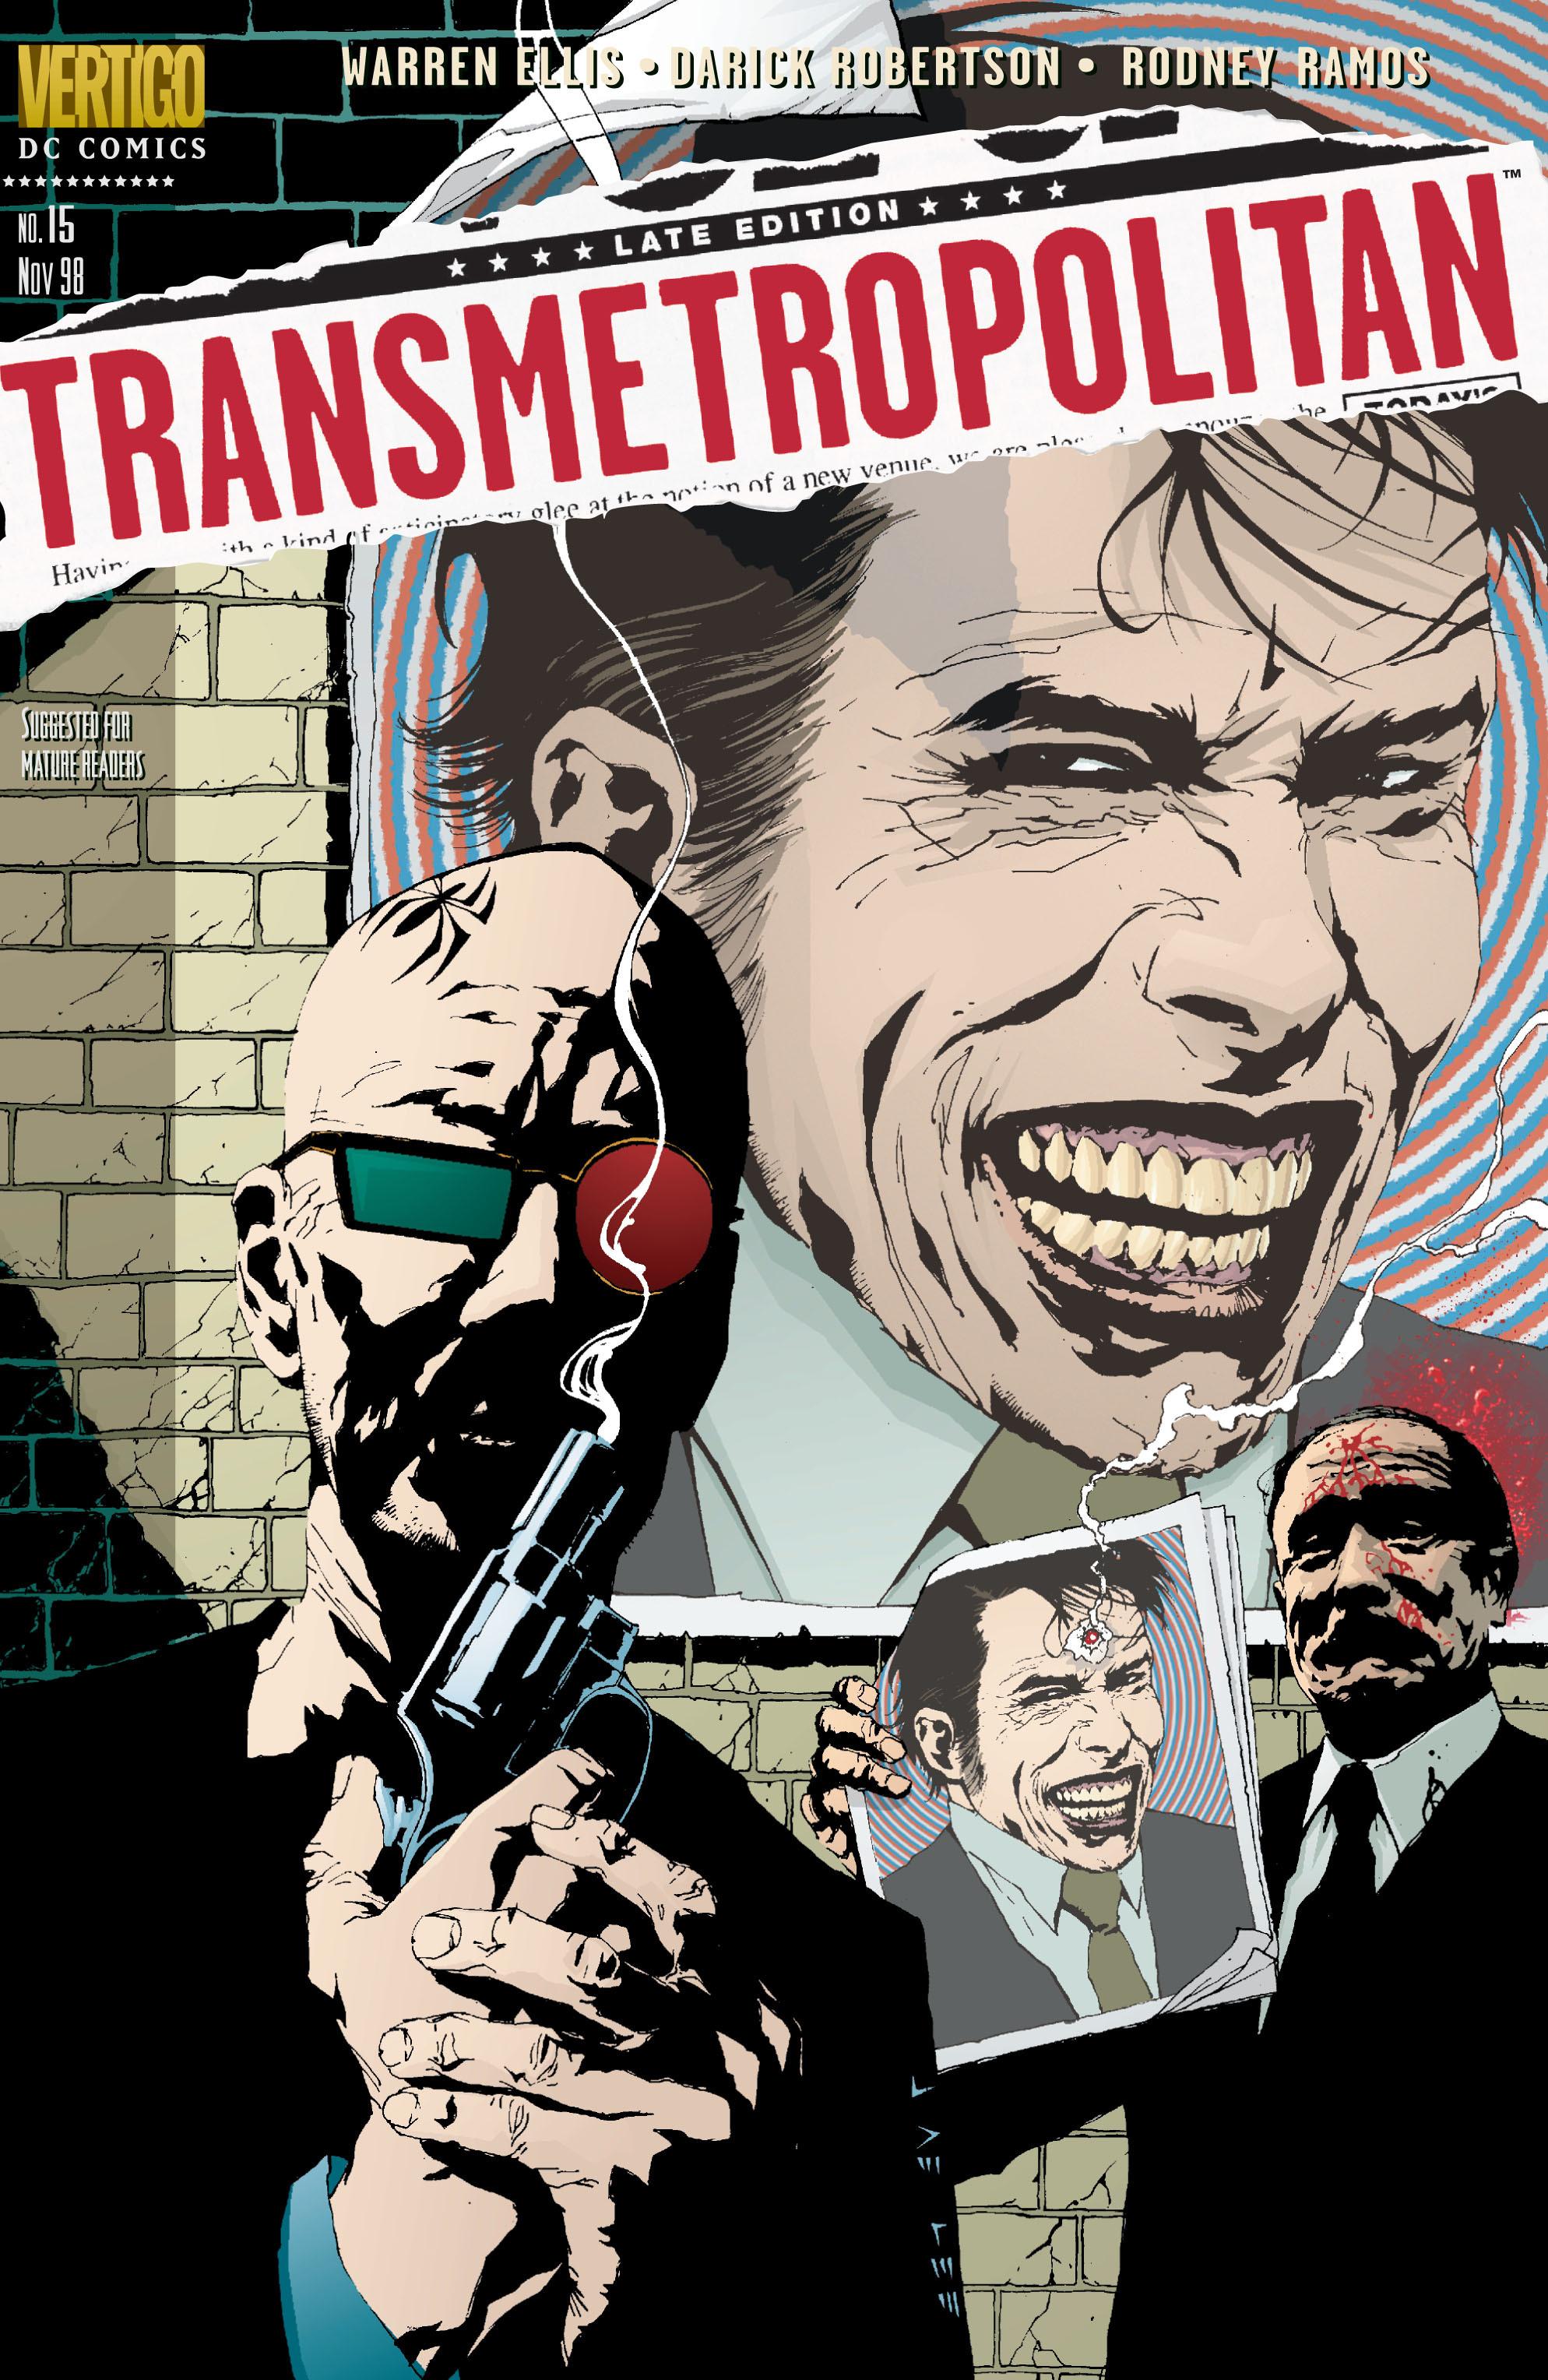 Read online Transmetropolitan comic -  Issue #15 - 1